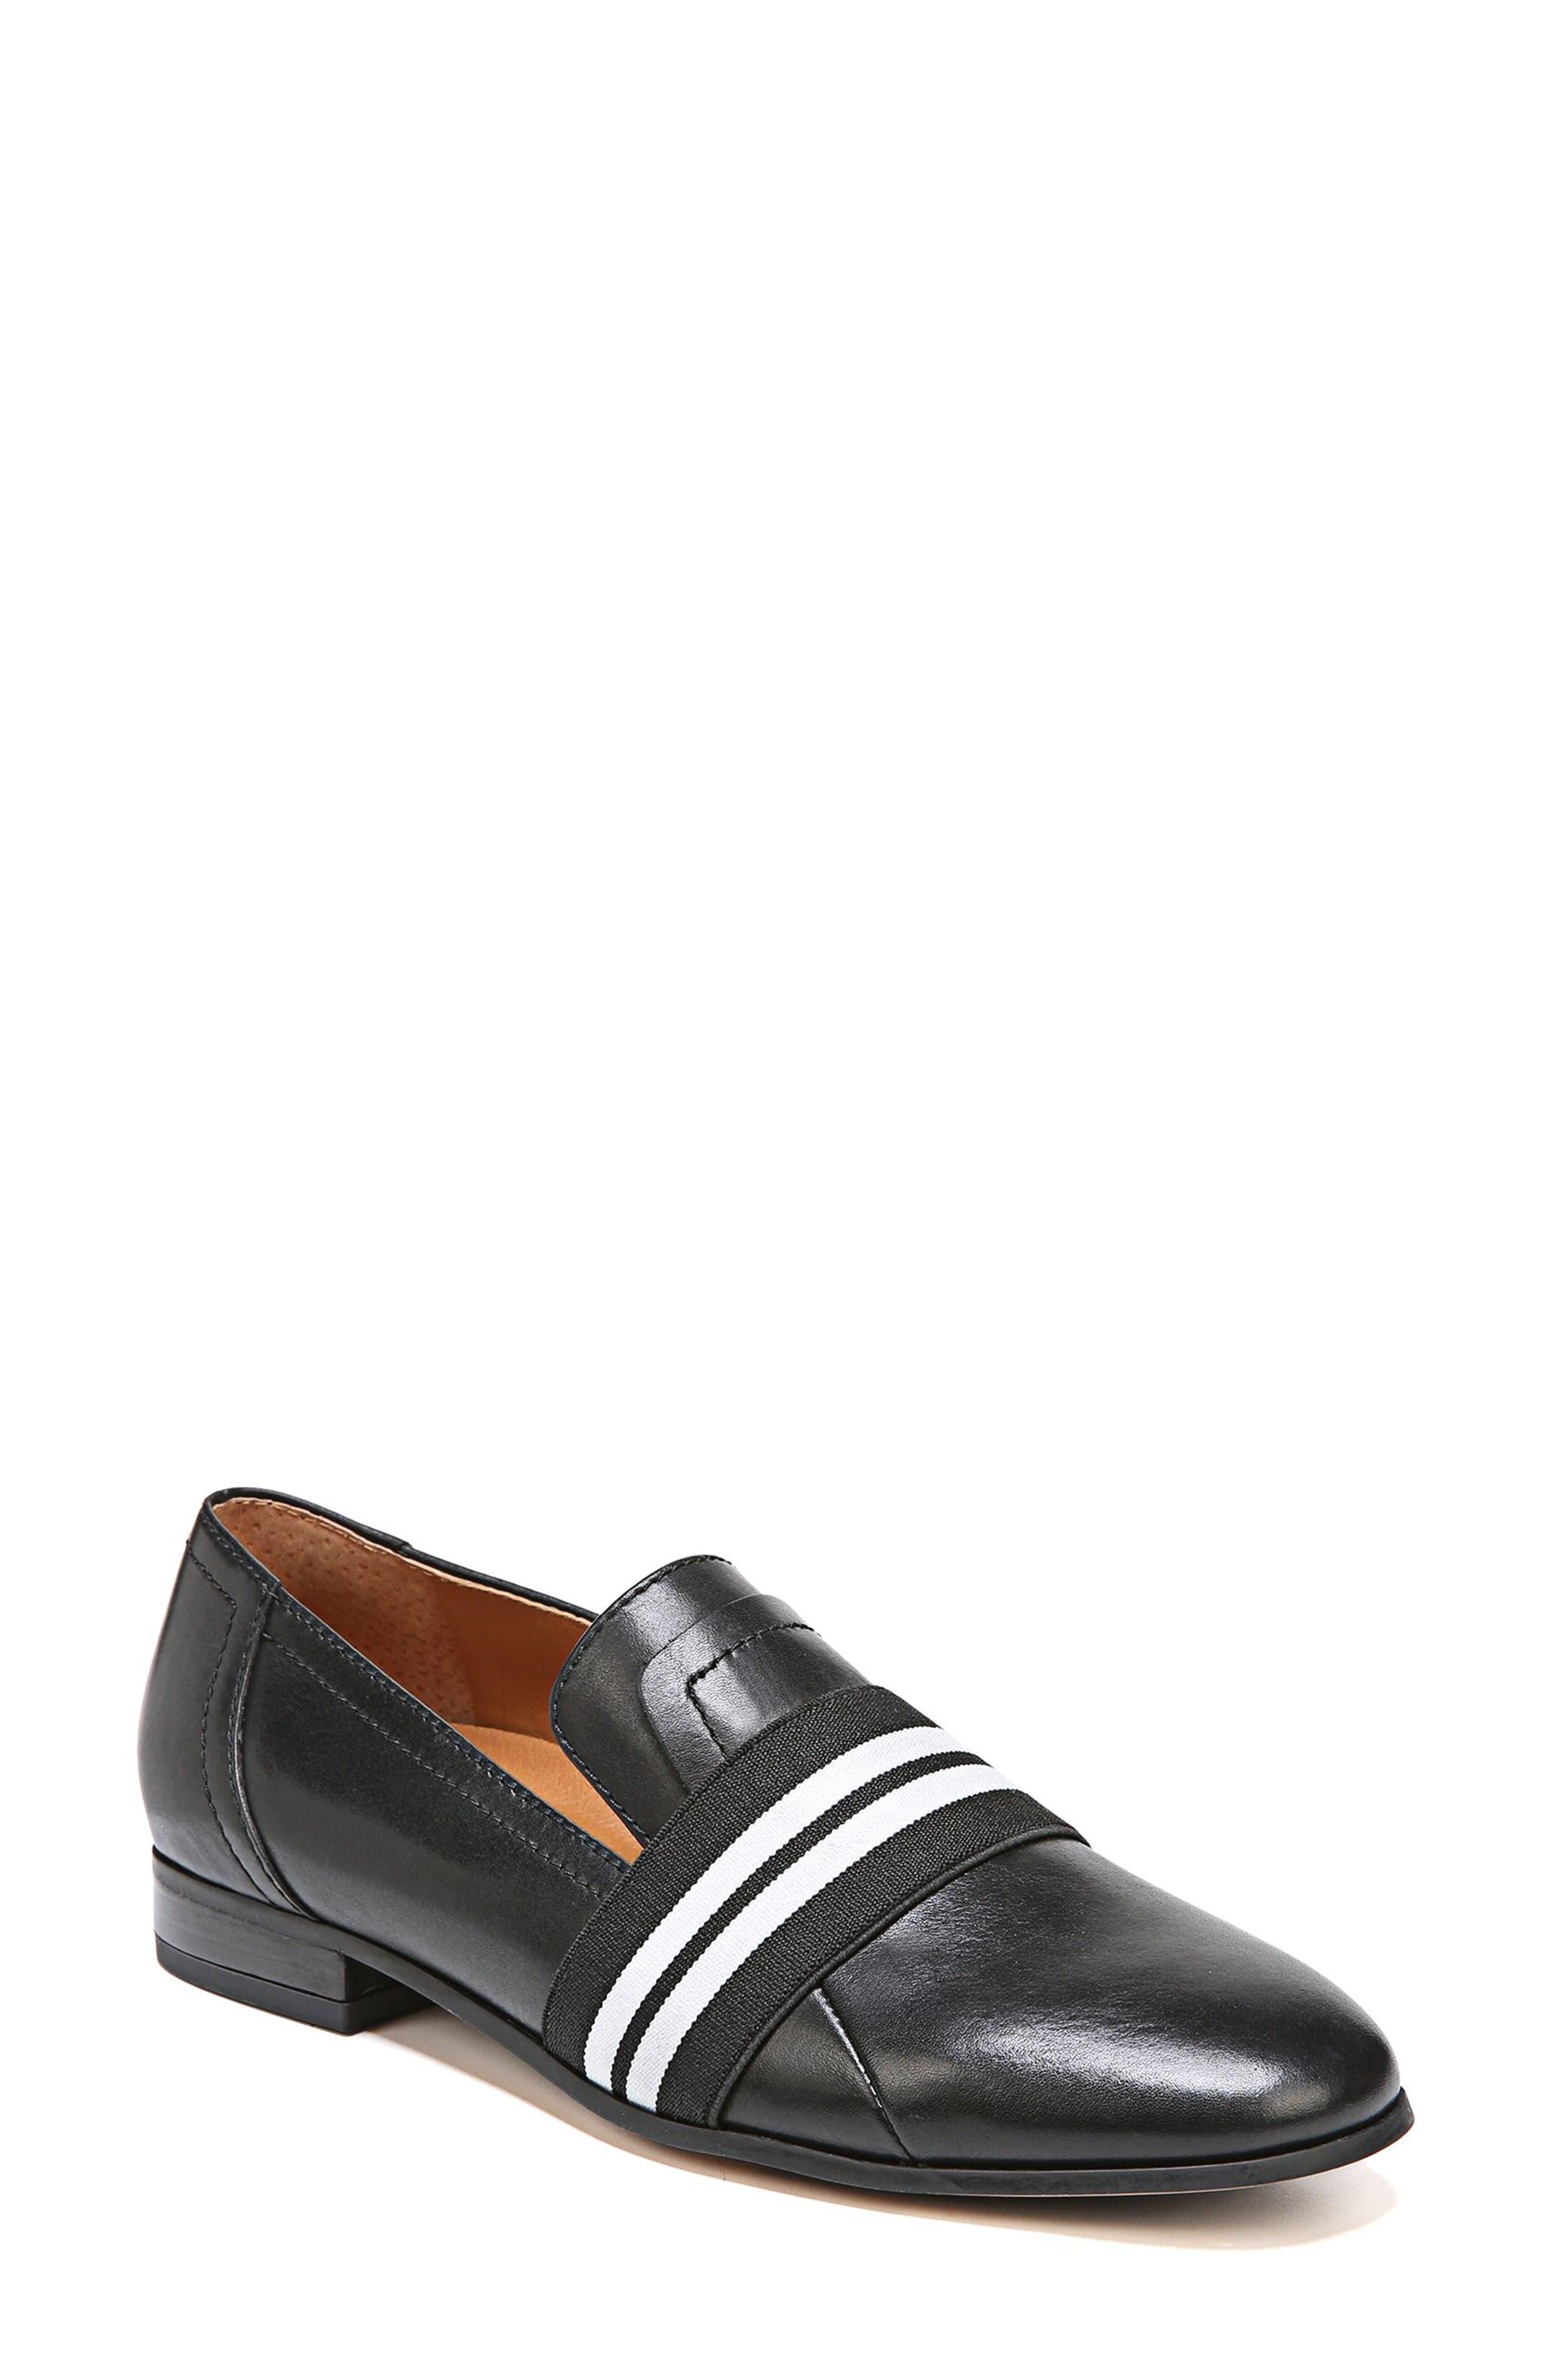 Odyssey Loafer,                         Main,                         color, 001